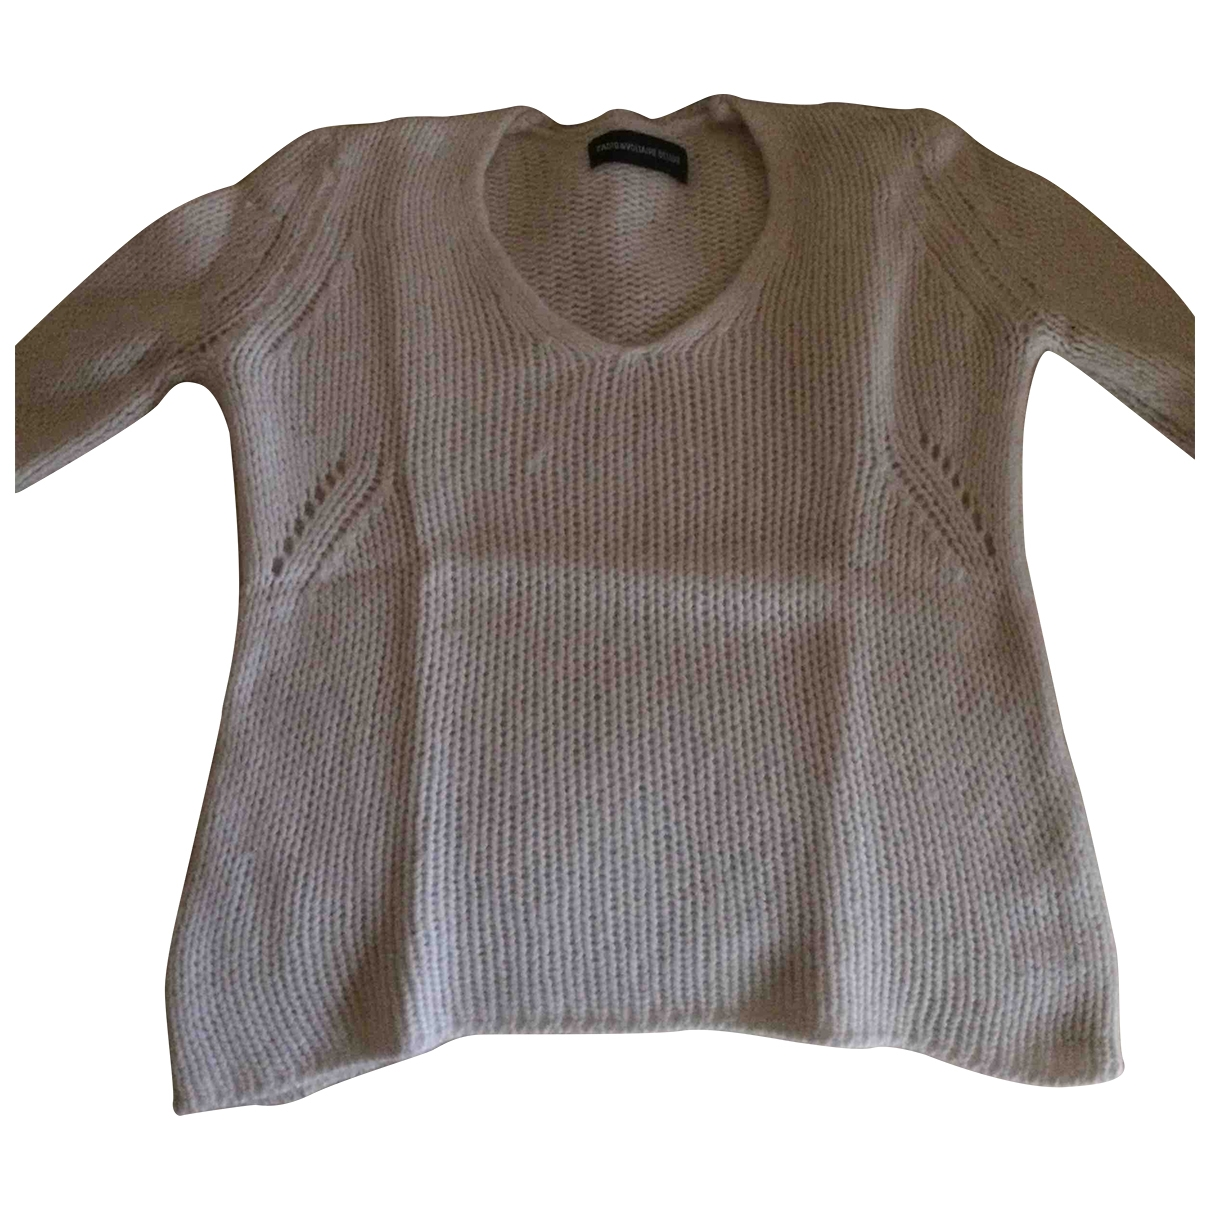 Zadig & Voltaire Spring Summer 2019 White Cashmere Knitwear for Women 34 FR